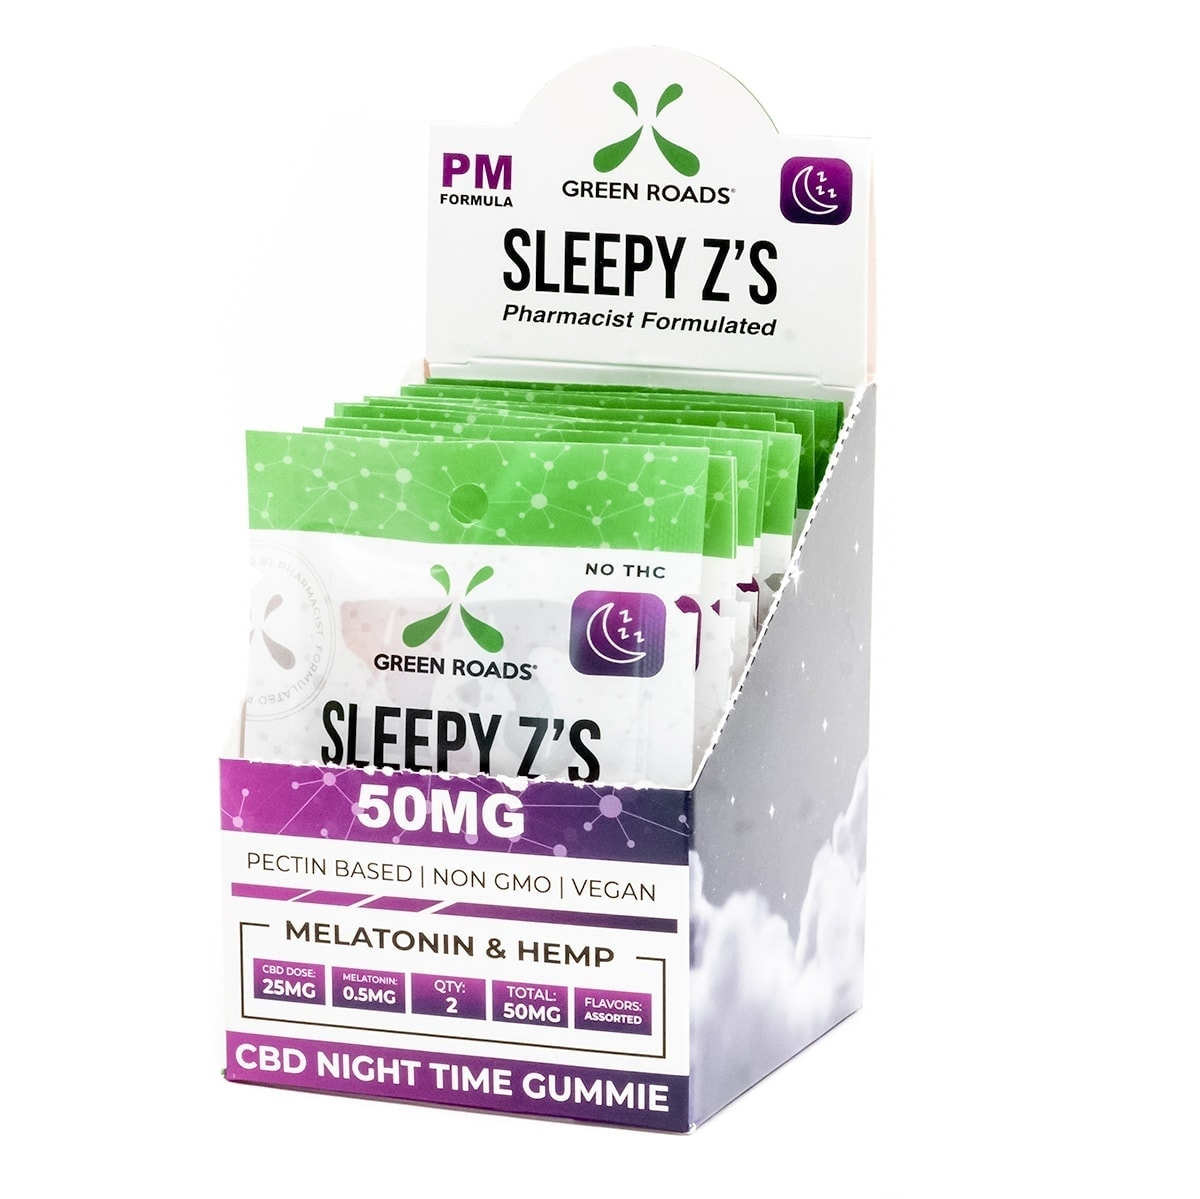 green-roads-sleepy-z-s-cbd-gummies-with-melatonin-2-count-50mg-of-cbd